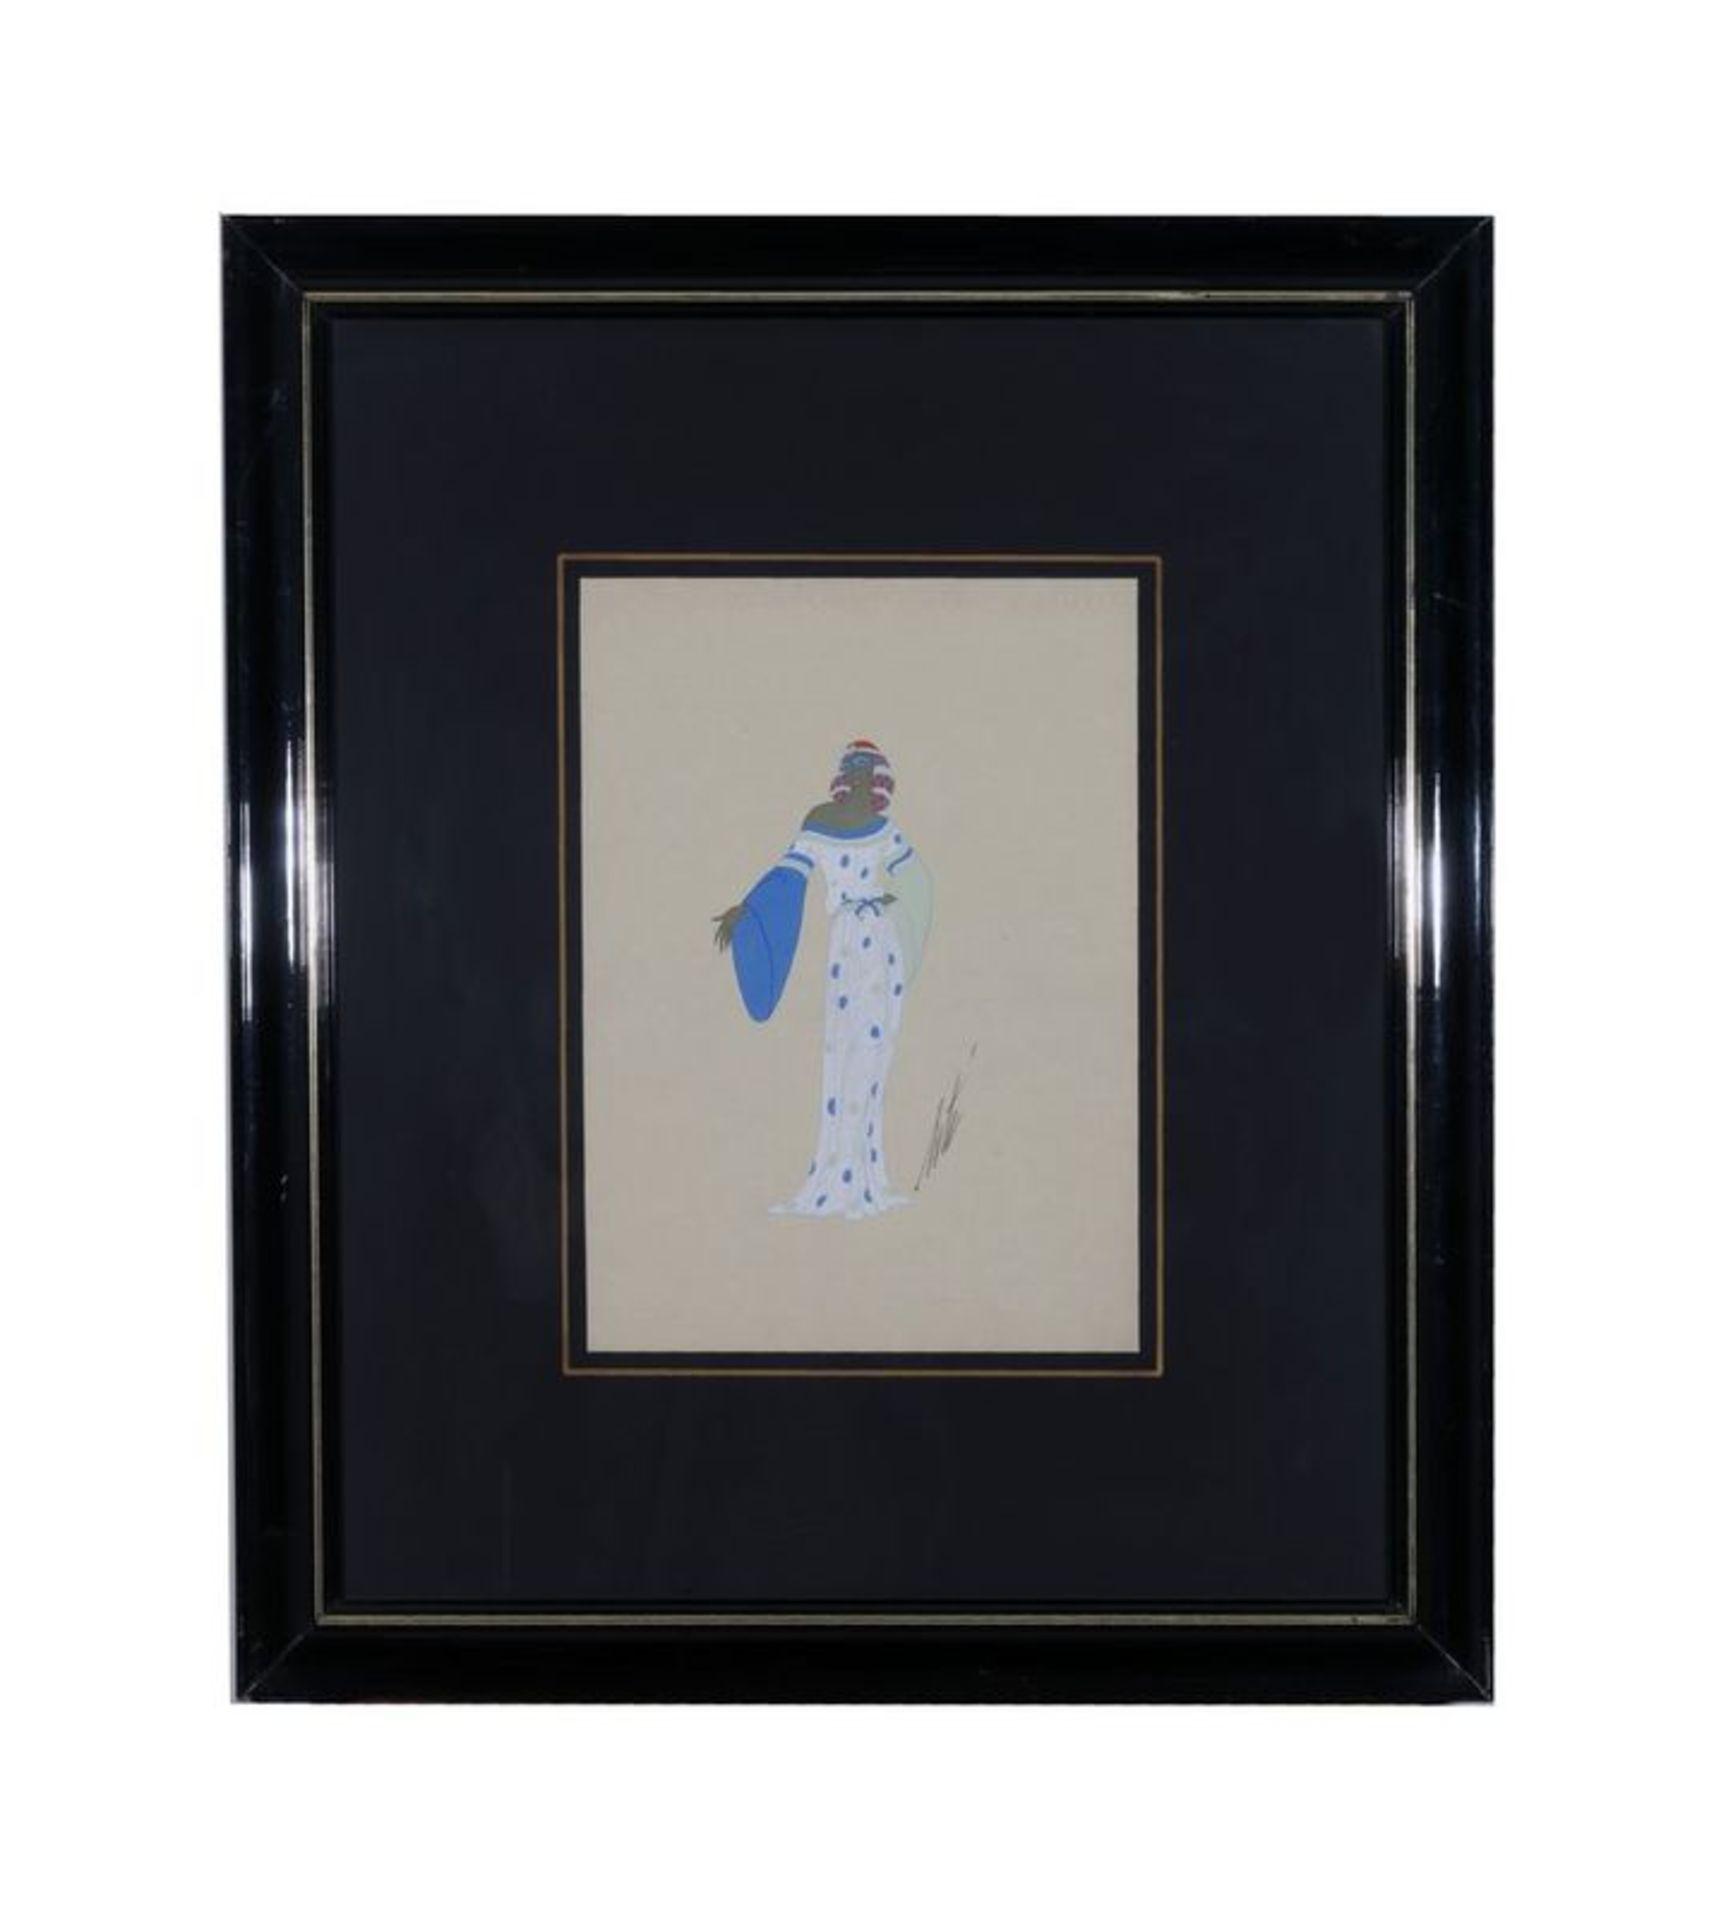 Los 530 - ERTE (1892-1990) Rose du Mal de Servand. 1940 Pencil and tempera on paper - [...]